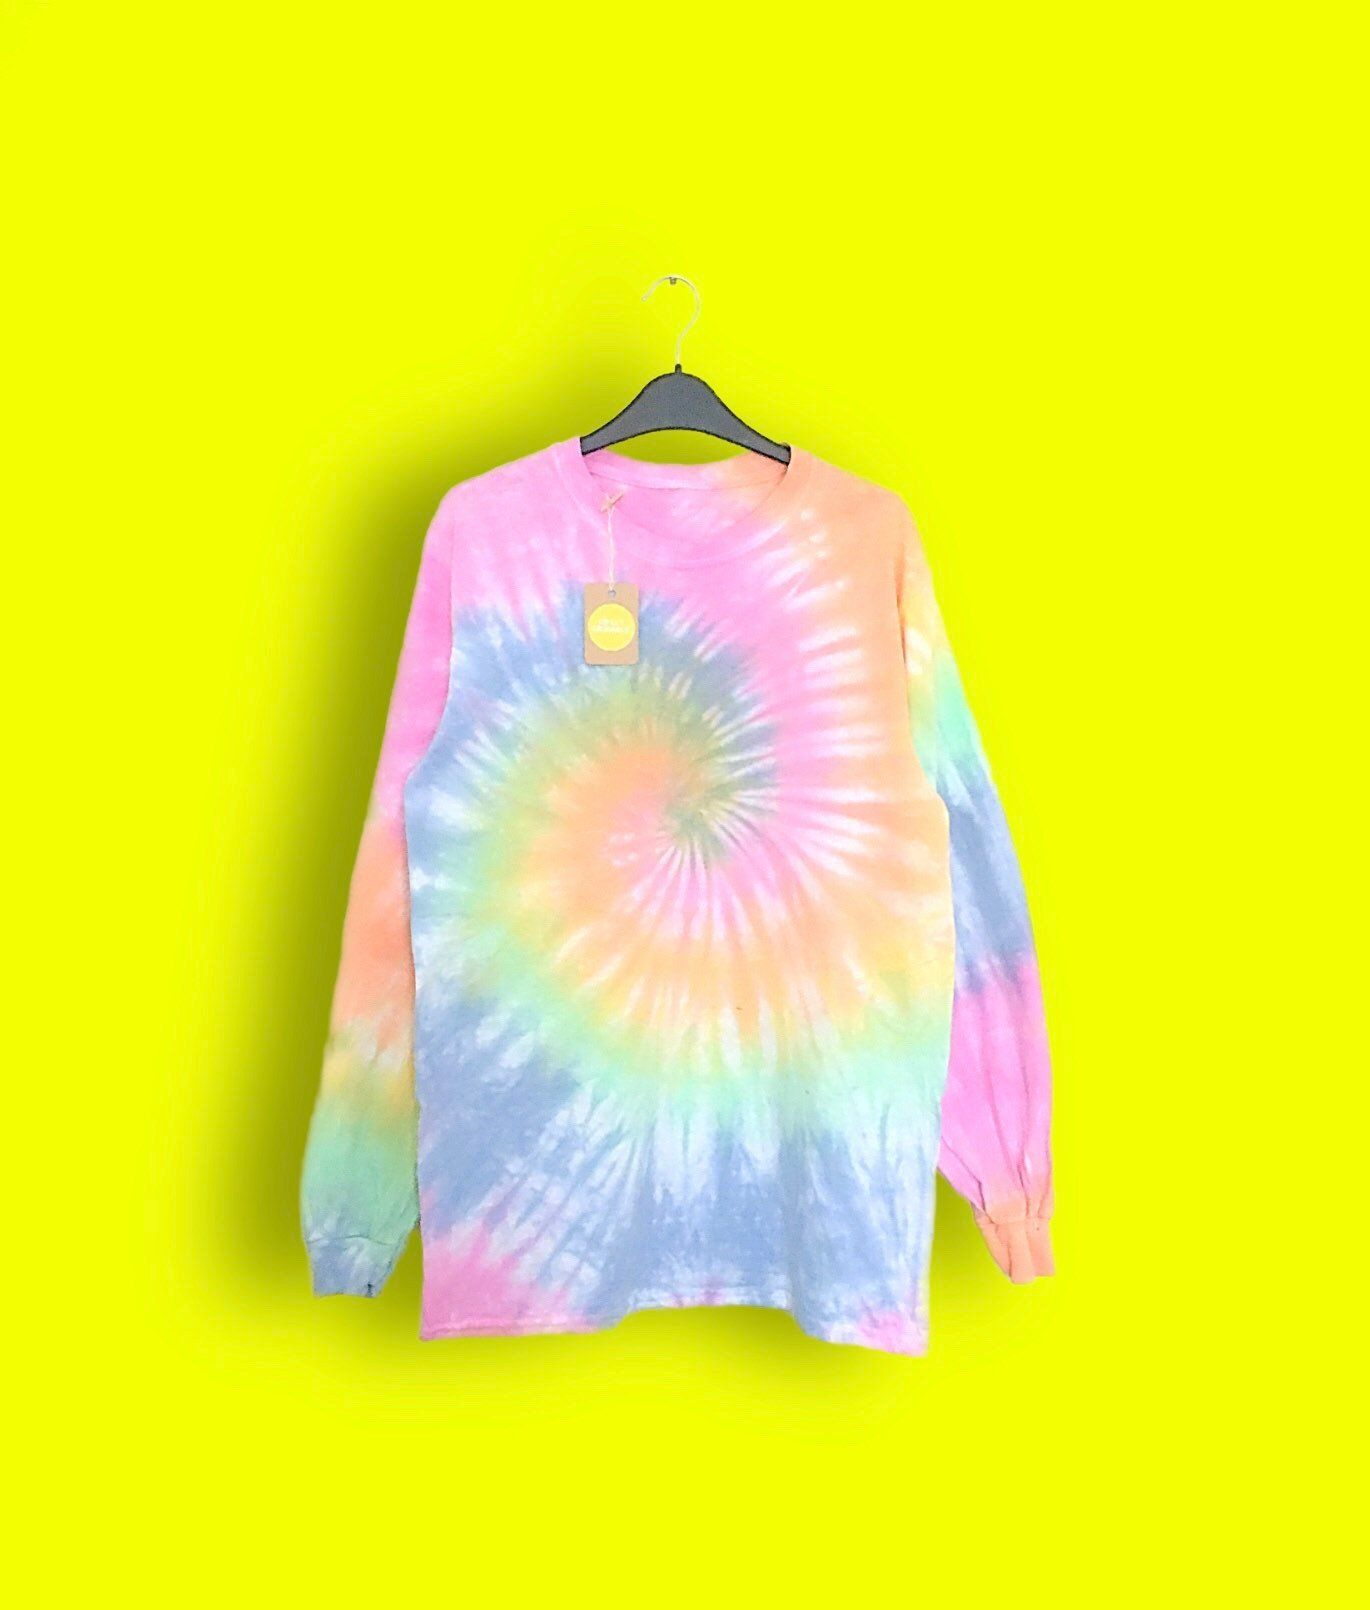 ba5b00e249391 Long sleeve pastel tie dye | Unisex, Plain tie dye, pastel, spiral ...